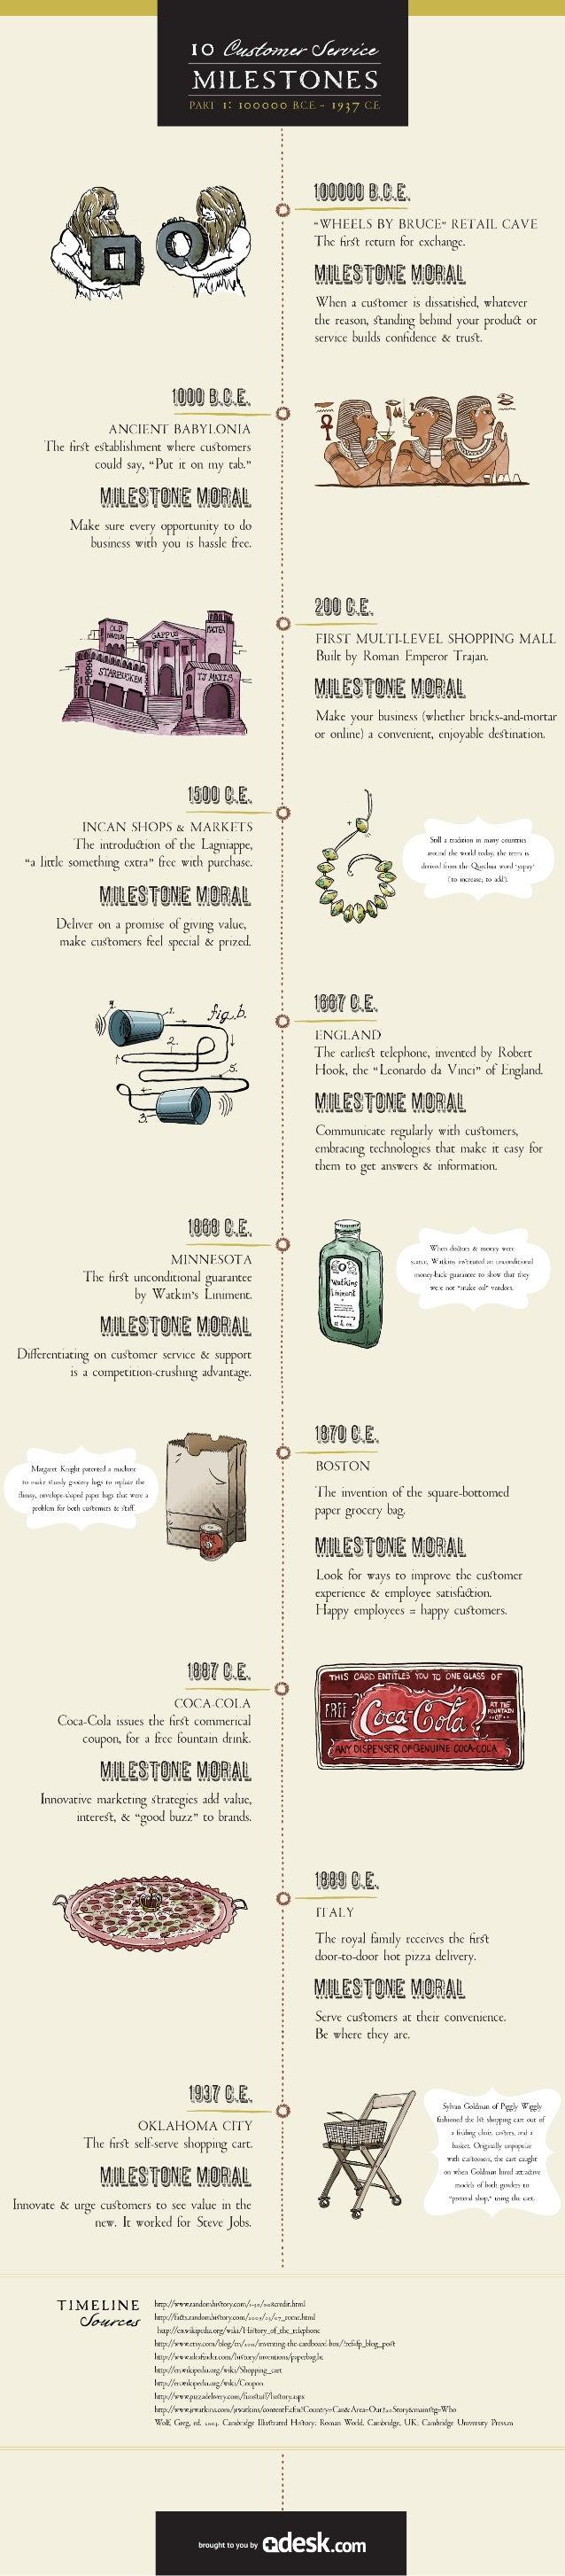 Customer Service Milestones An Historical Timeline